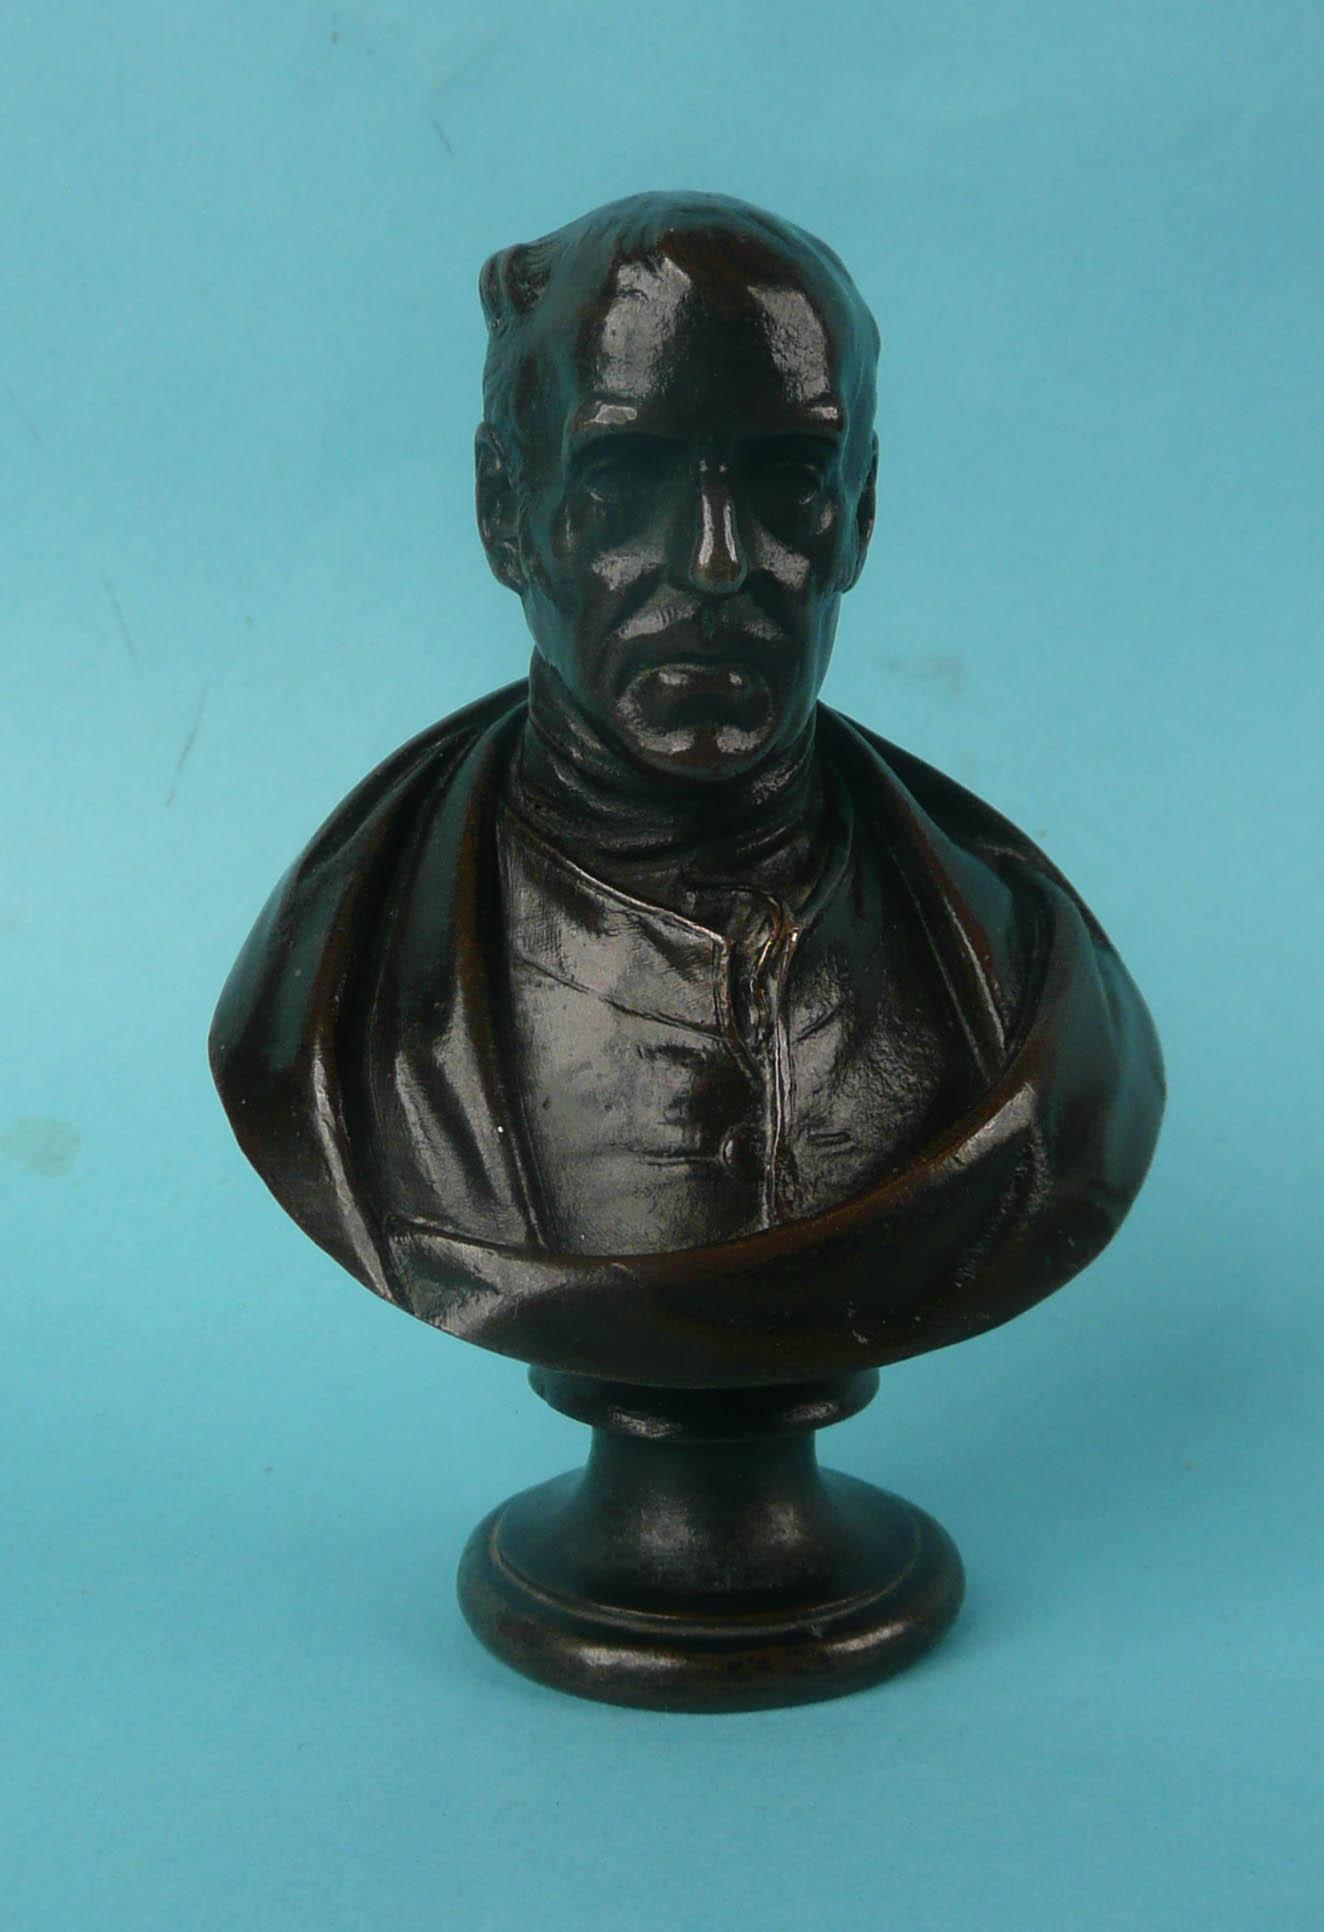 Lot 28 - 1852 Wellington: a good small bronze by Baron Carlo Marochetti the reverse signed and dated Novbre